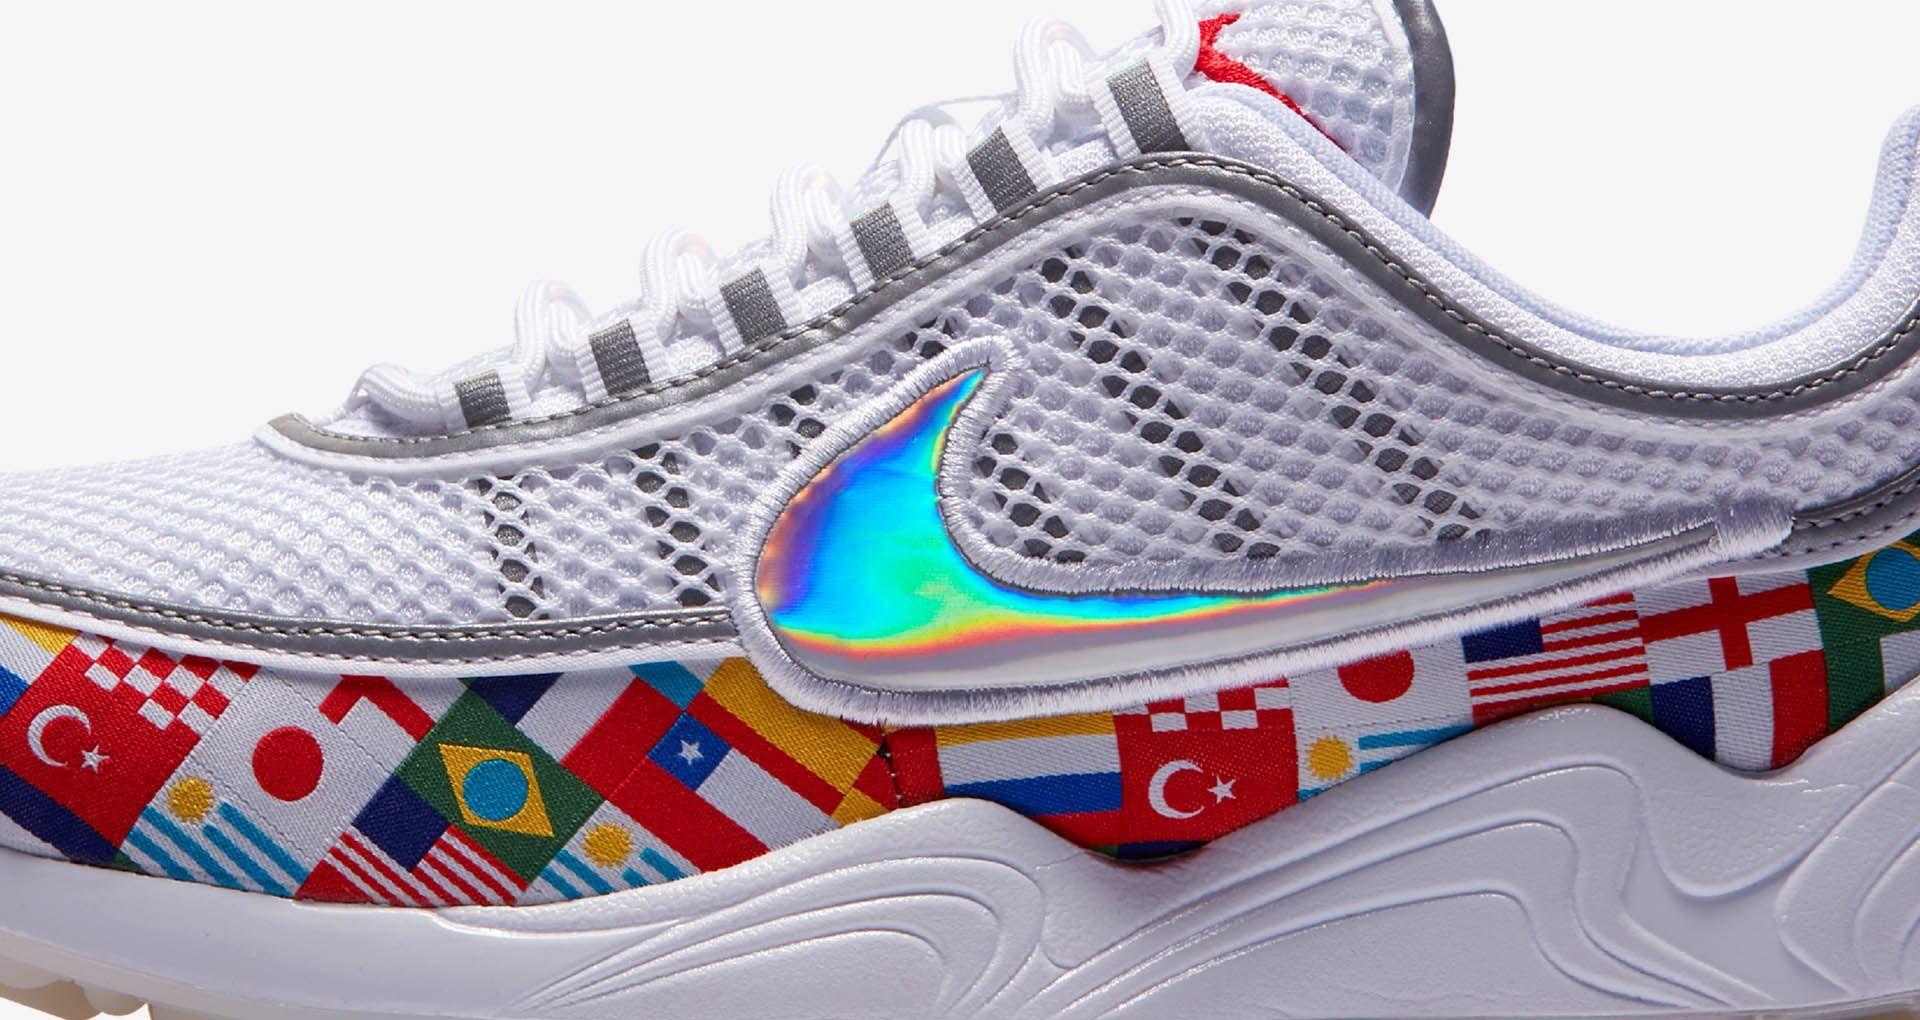 Nike Air Zoom Spiridon 'White & Multicolour' Release Date